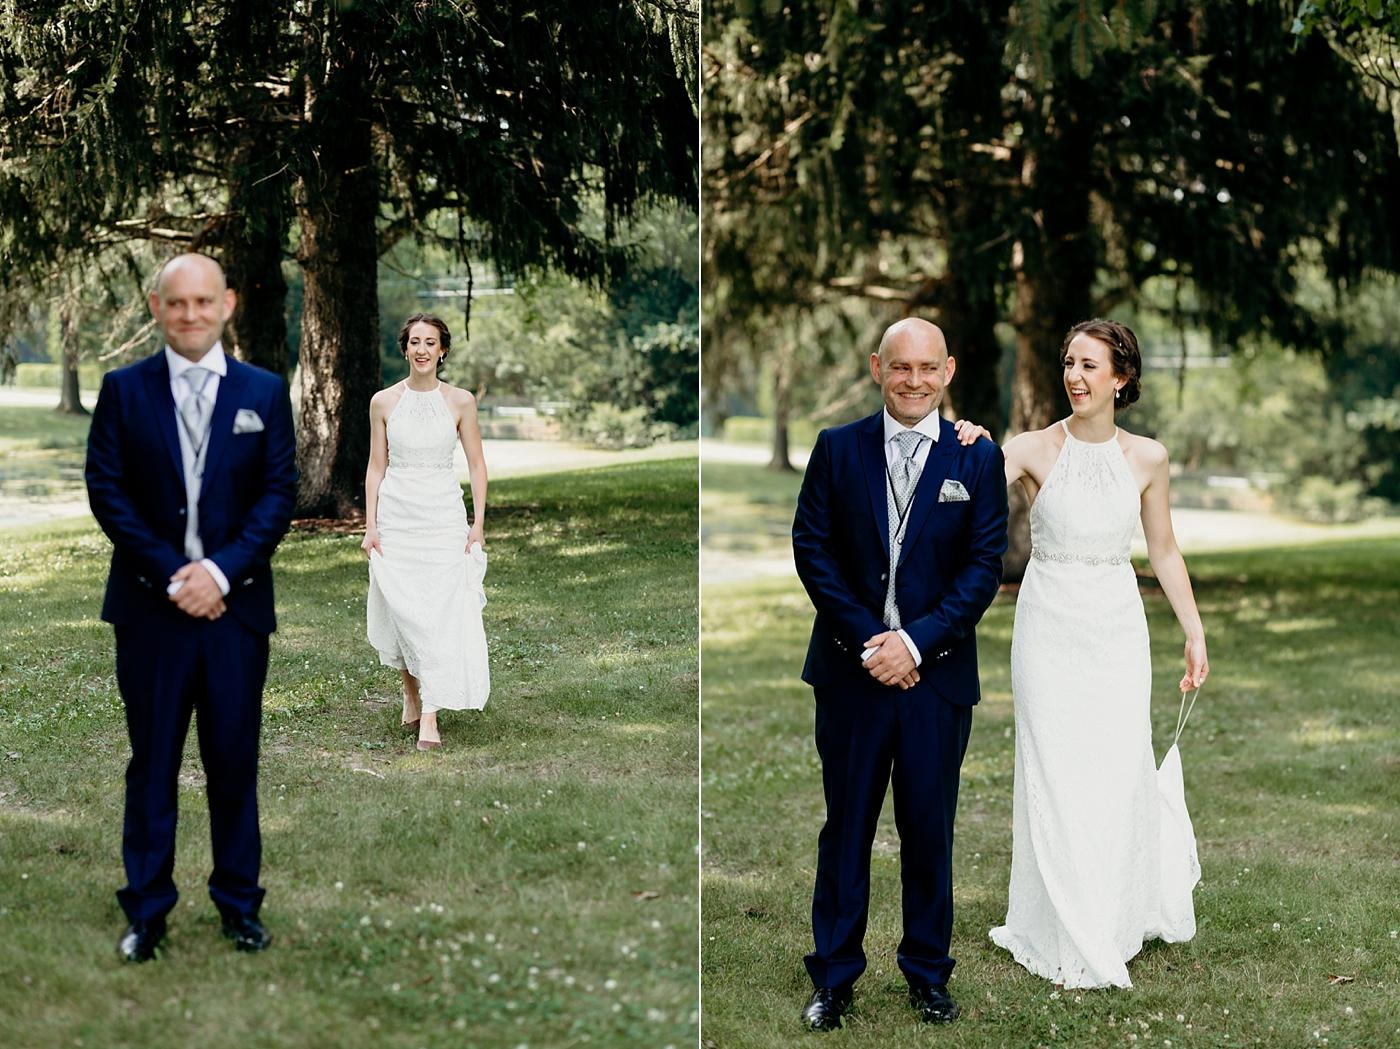 Chateau-Michelle-Wedding-Julia+JuanLuis_TheHeartlandersCo2018LA-55.jpg